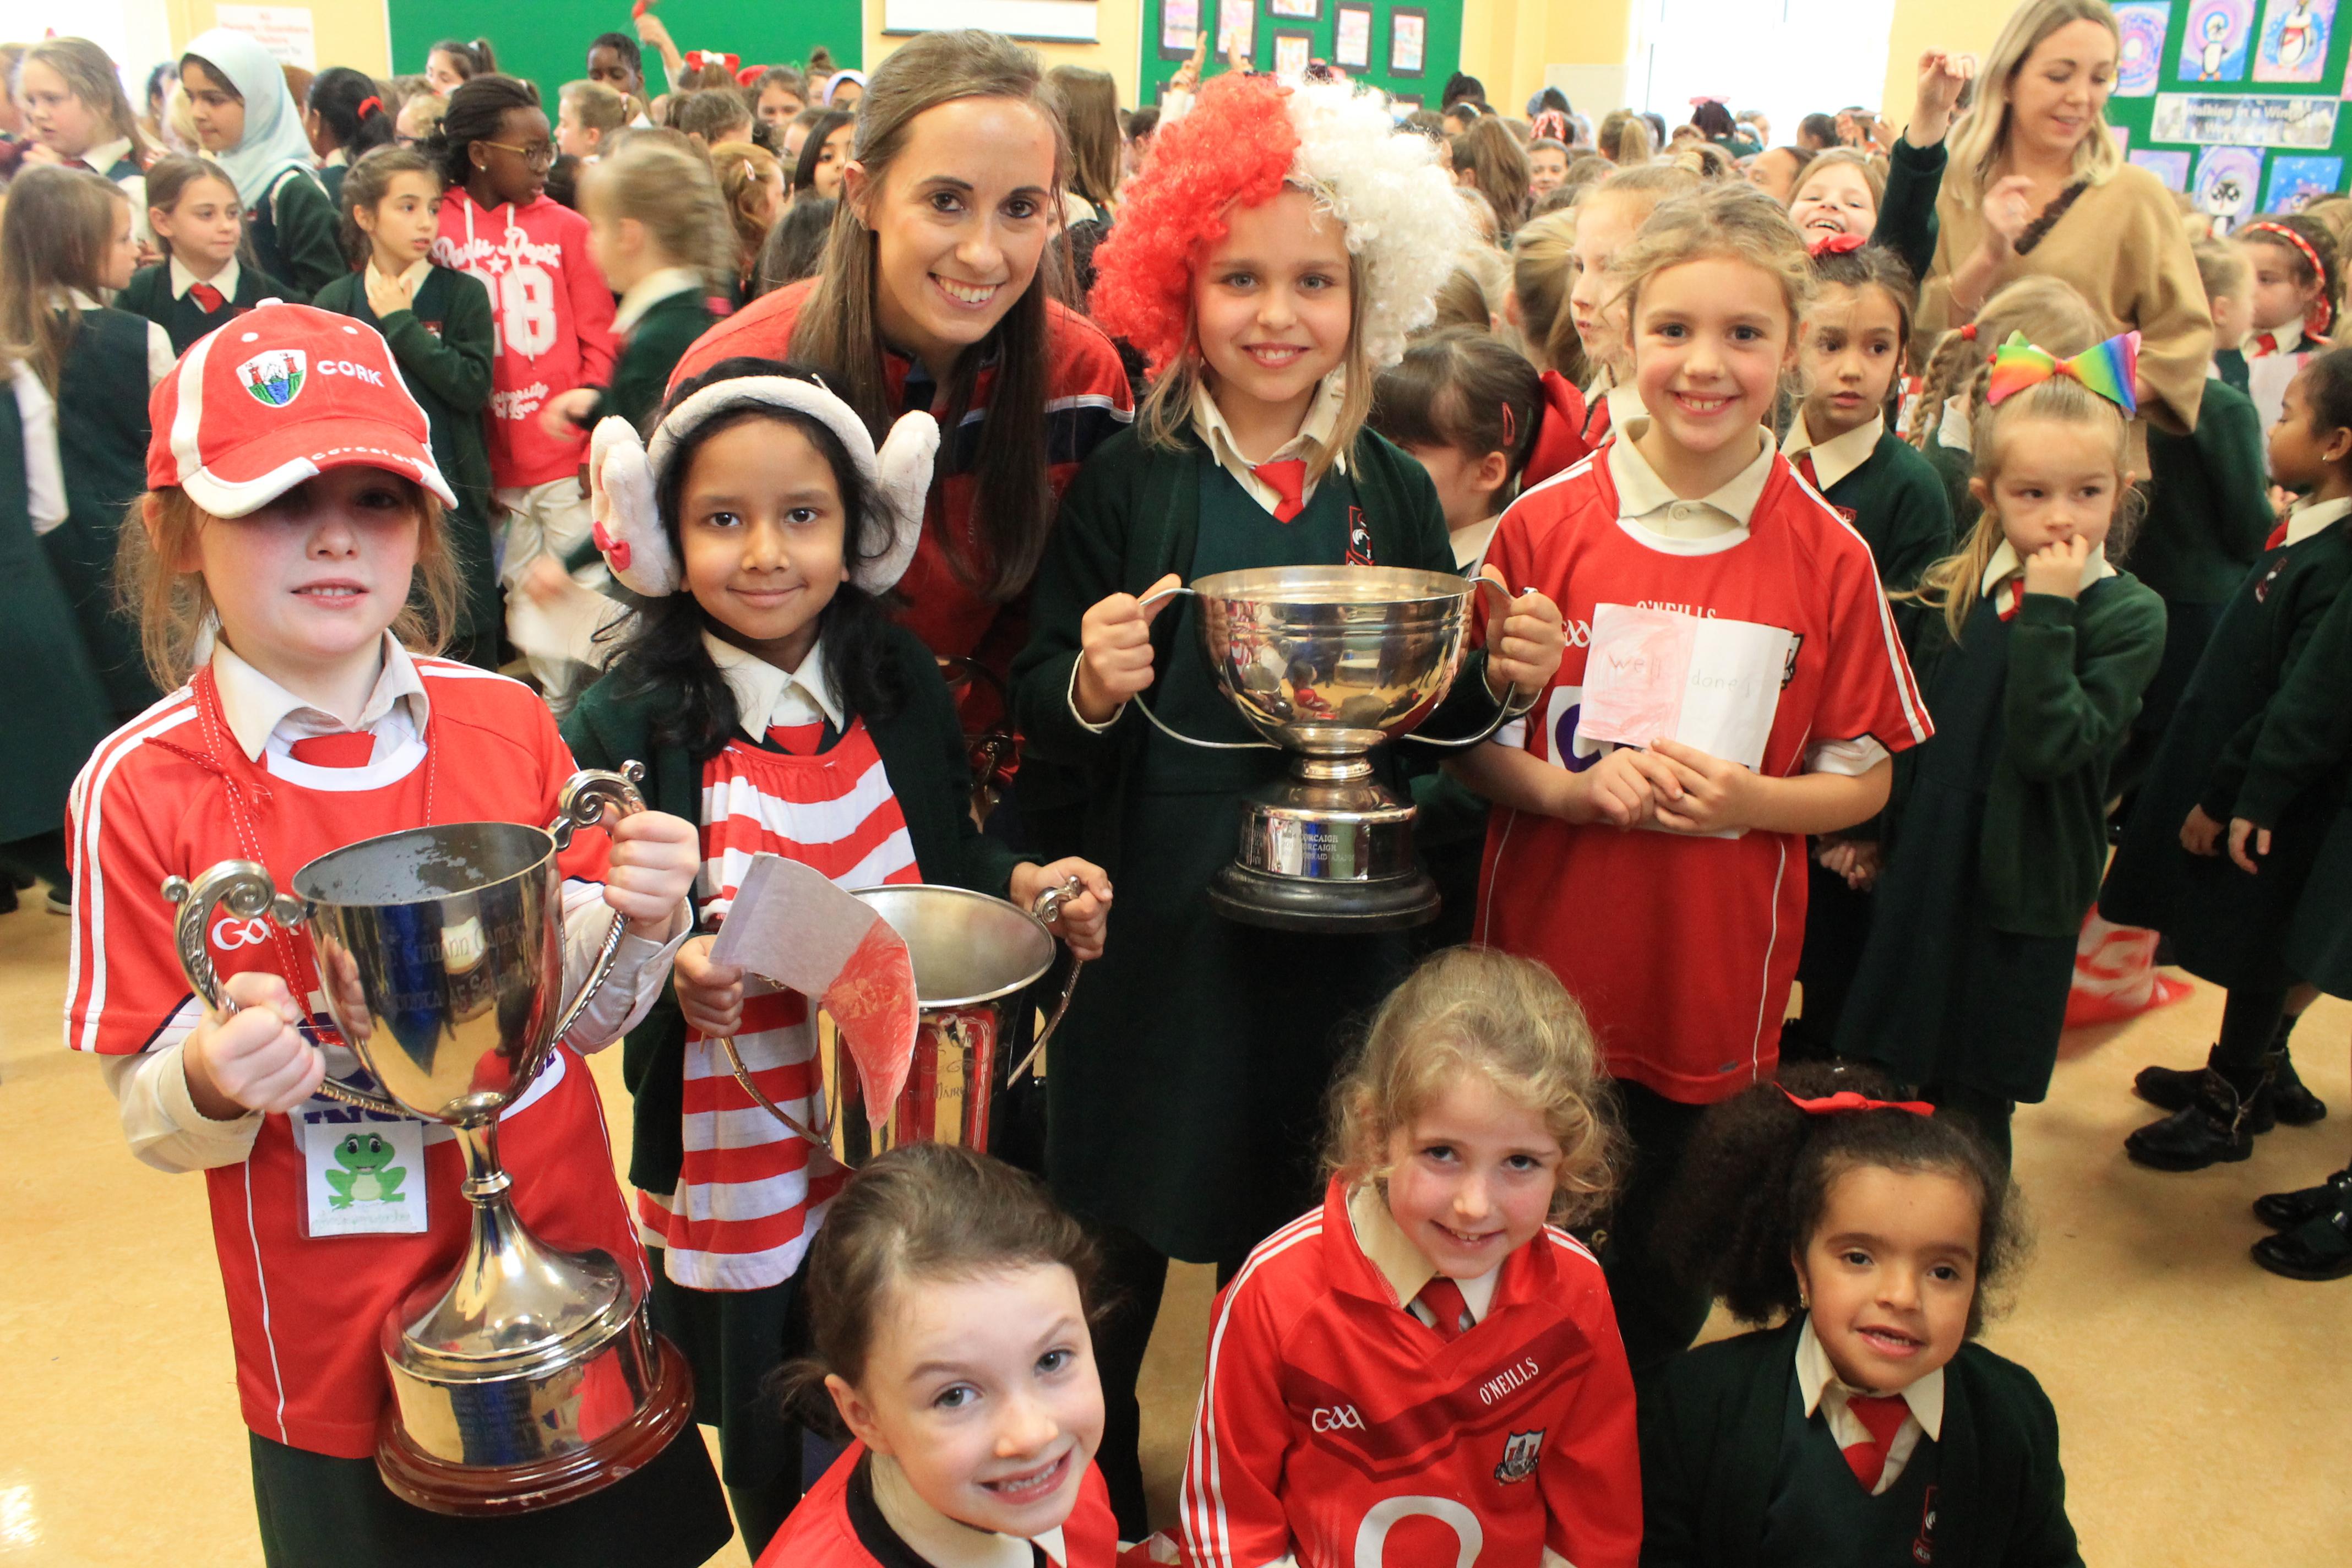 Triple All-Ireland Champions Visit Scoil Mhuire.